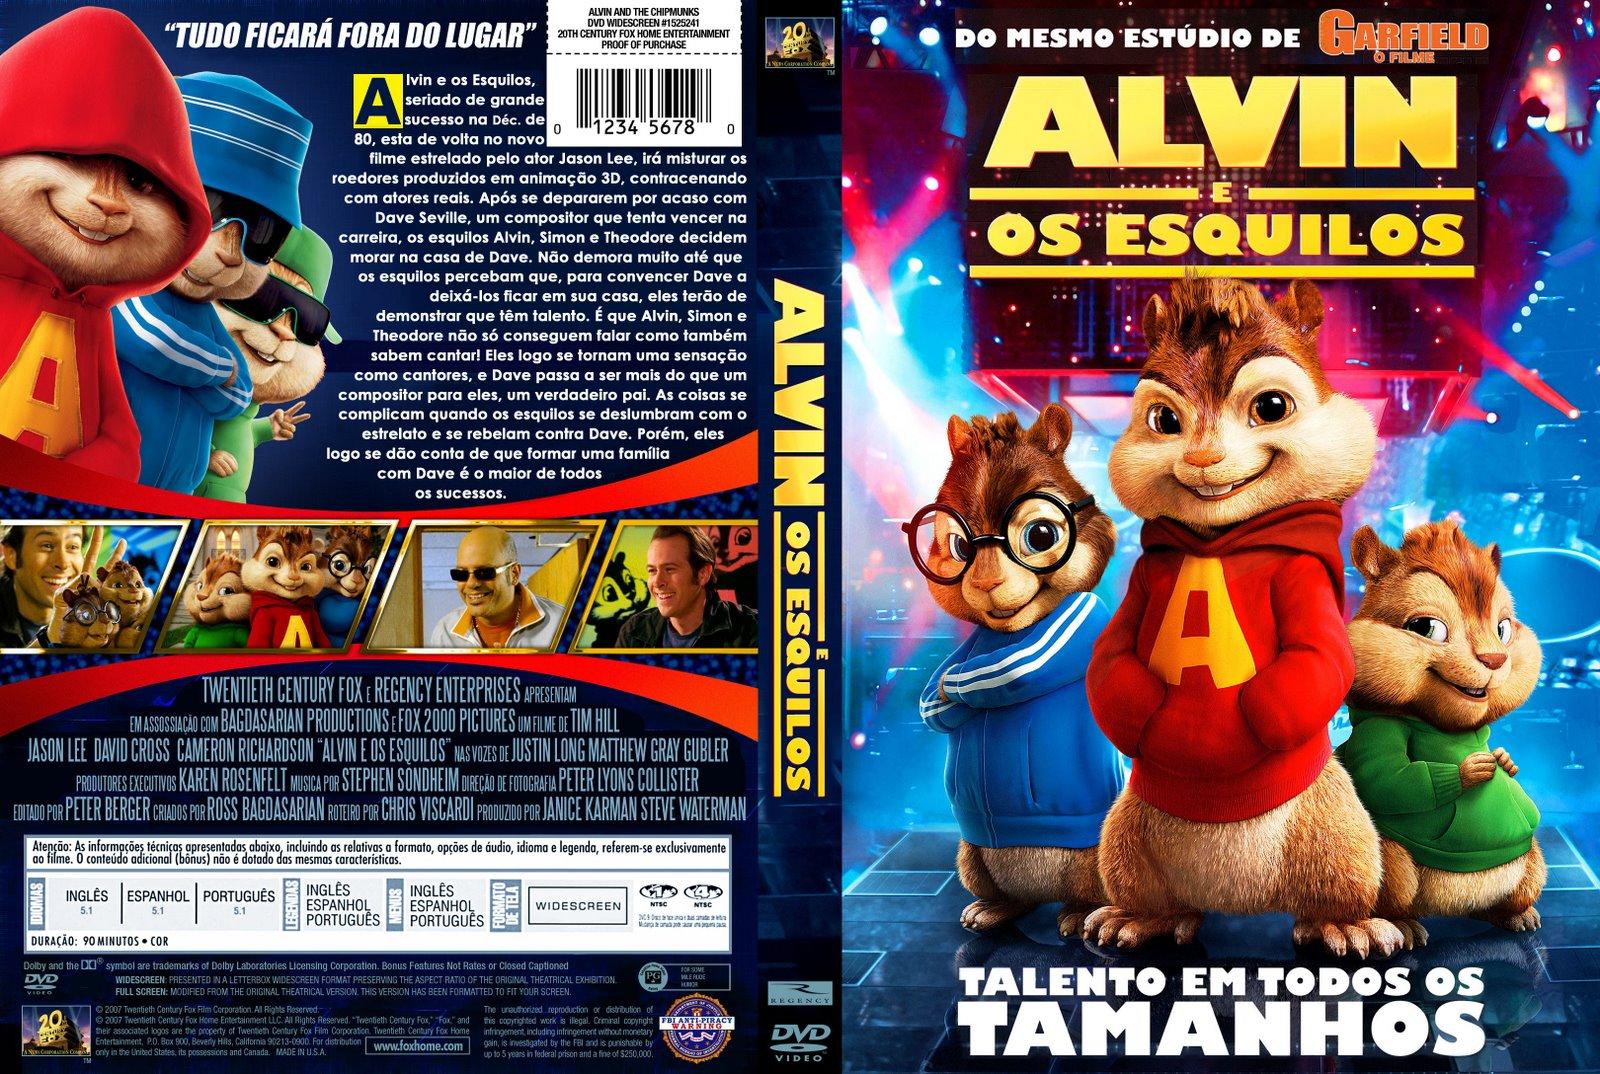 Alvin e os esquilos da cidade